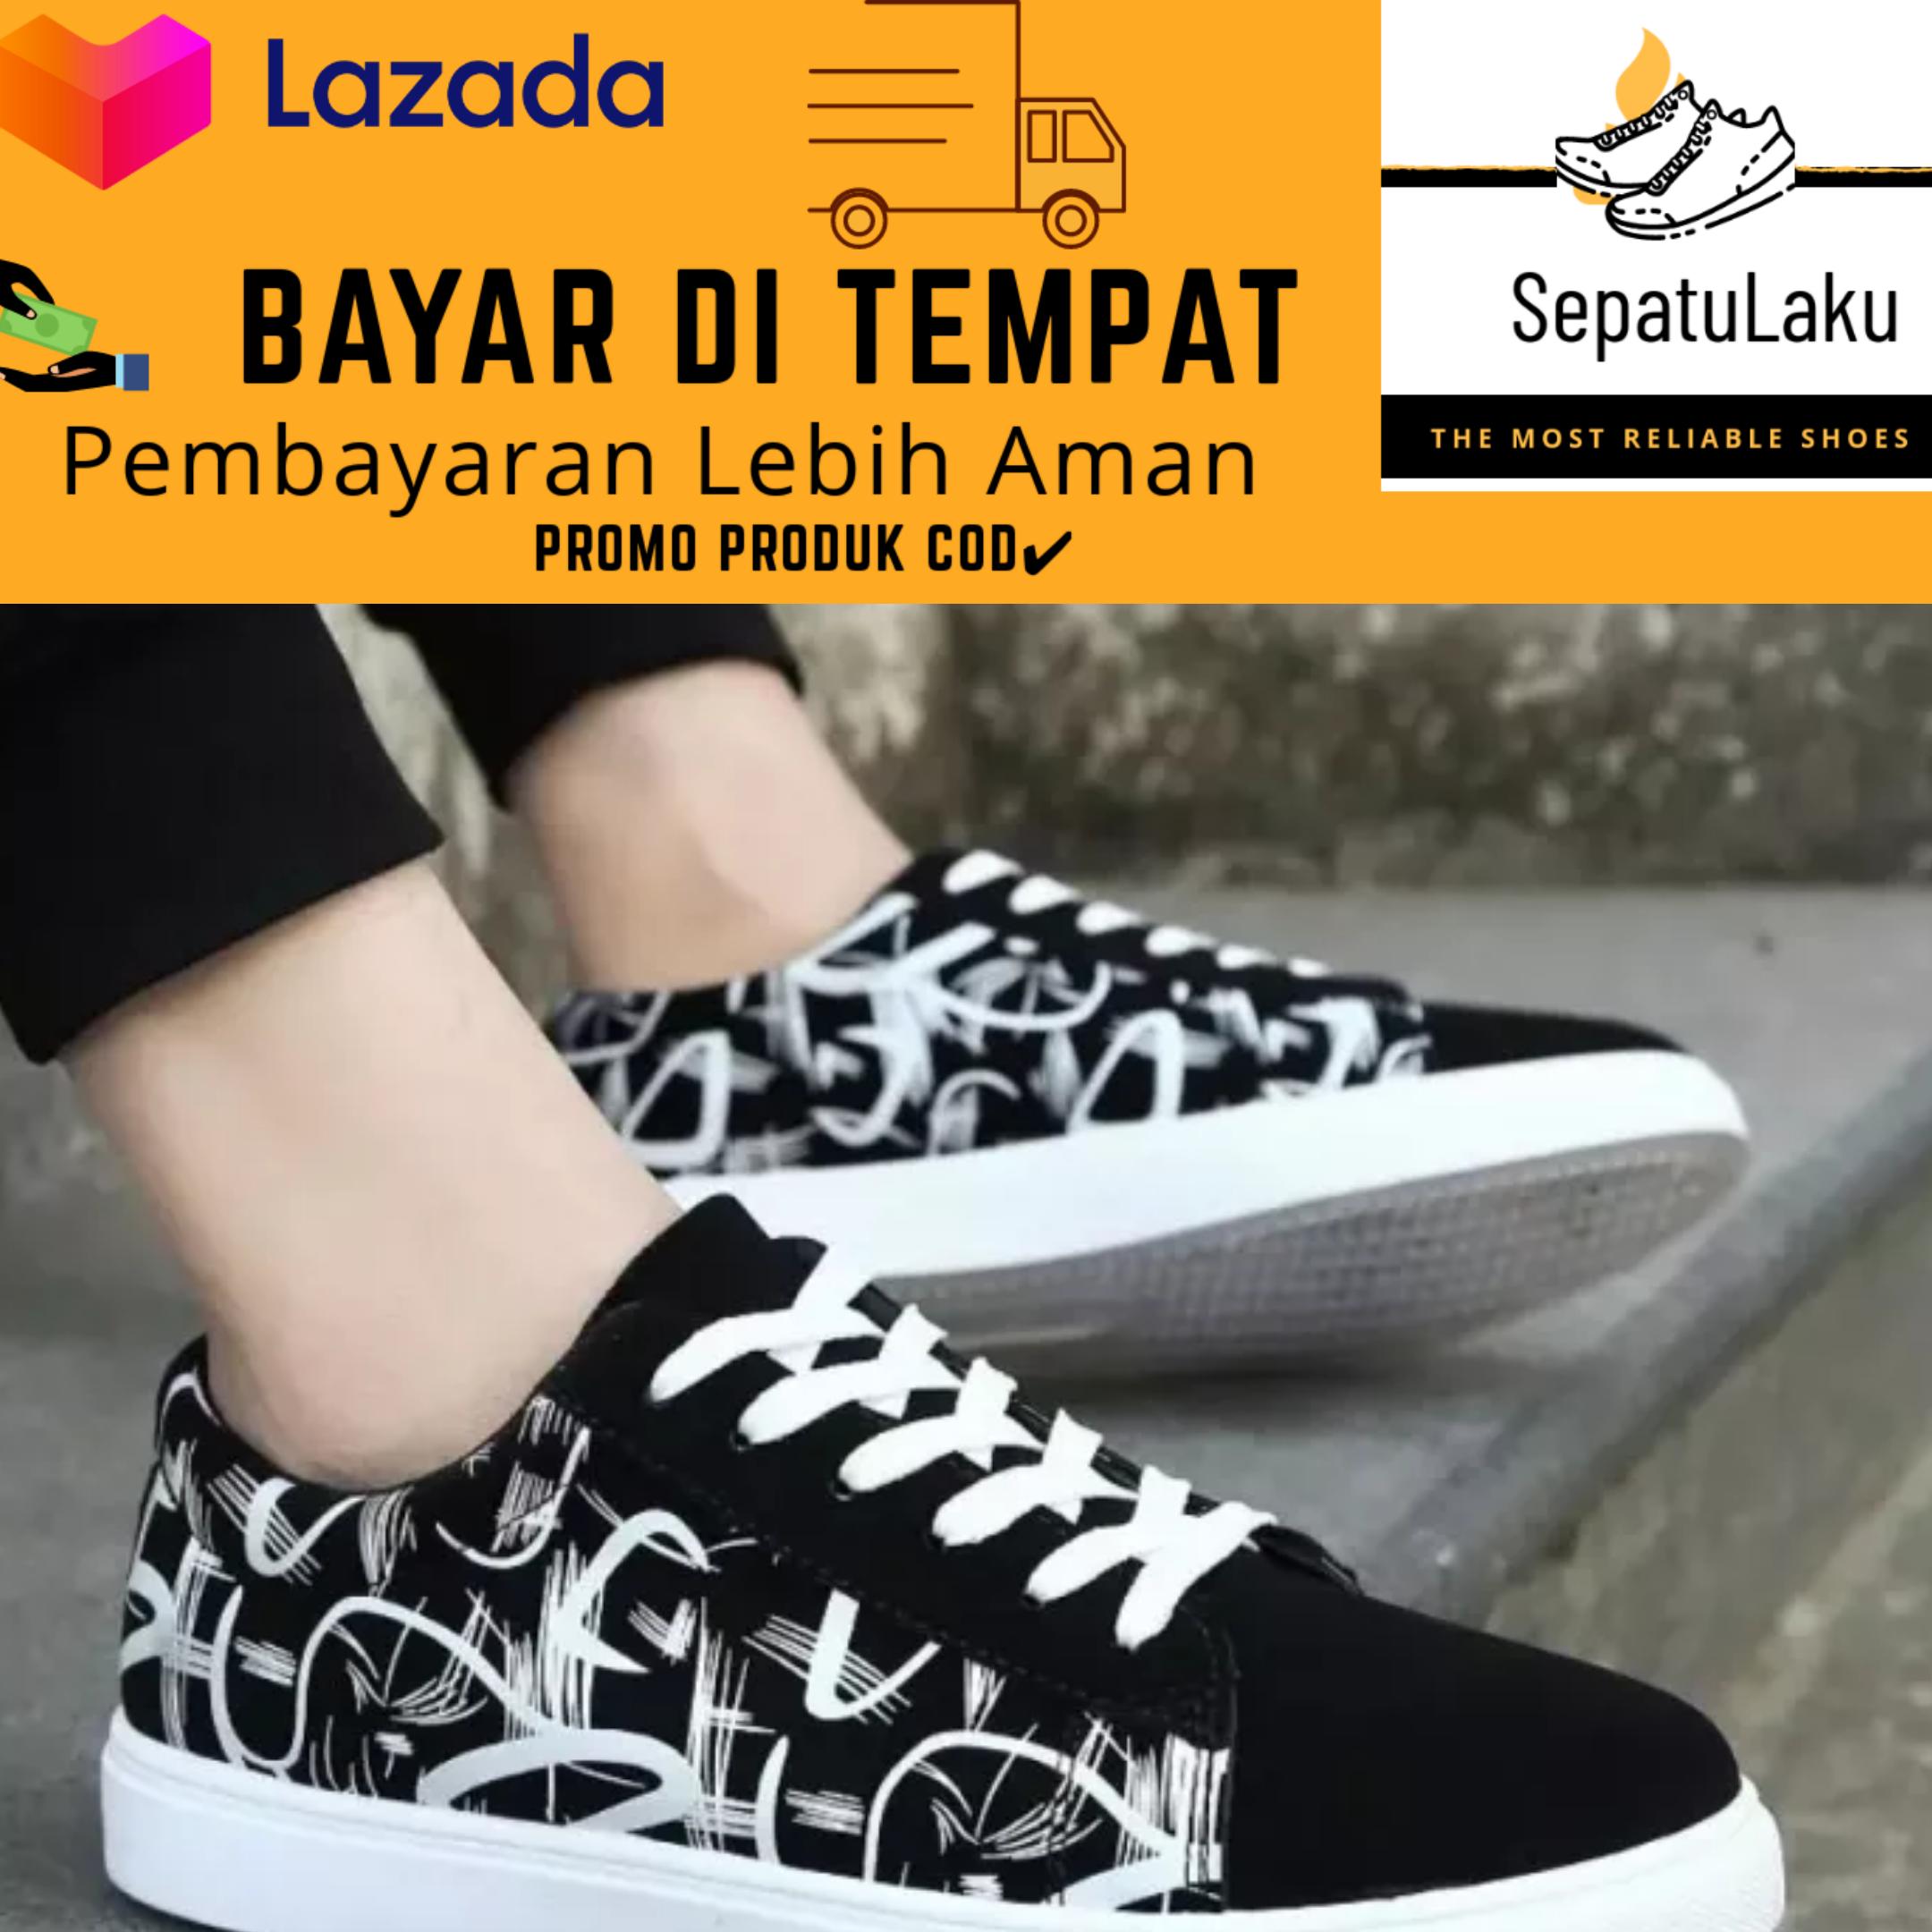 sepatu sneakers vans original old skool authentic terbaru vans ori ls lazada indonesia sepatu sneakers vans original old skool authentic terbaru vans ori ls